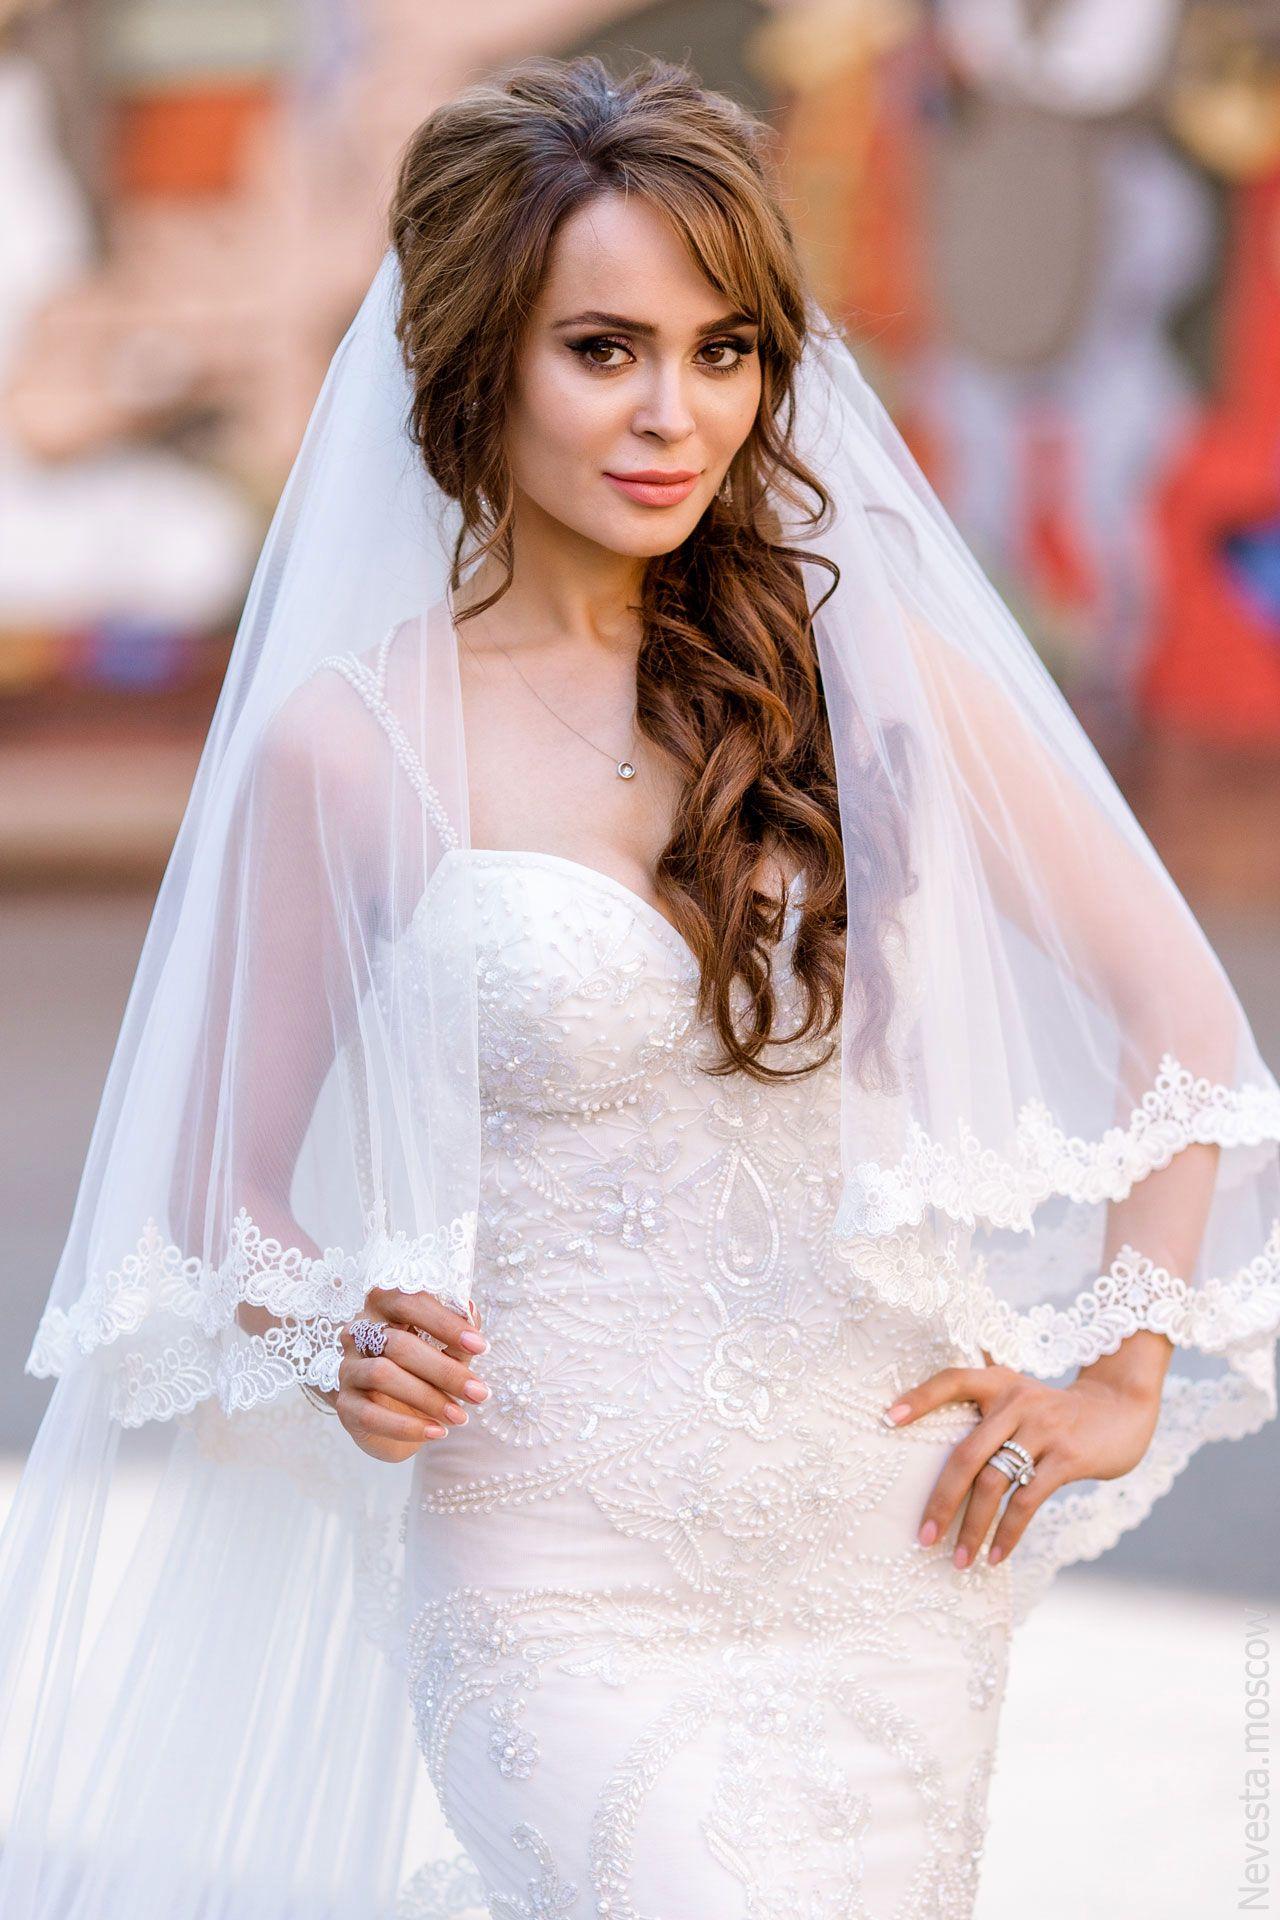 Актриса Анна Калашникова в образе белого лебедя фото 30